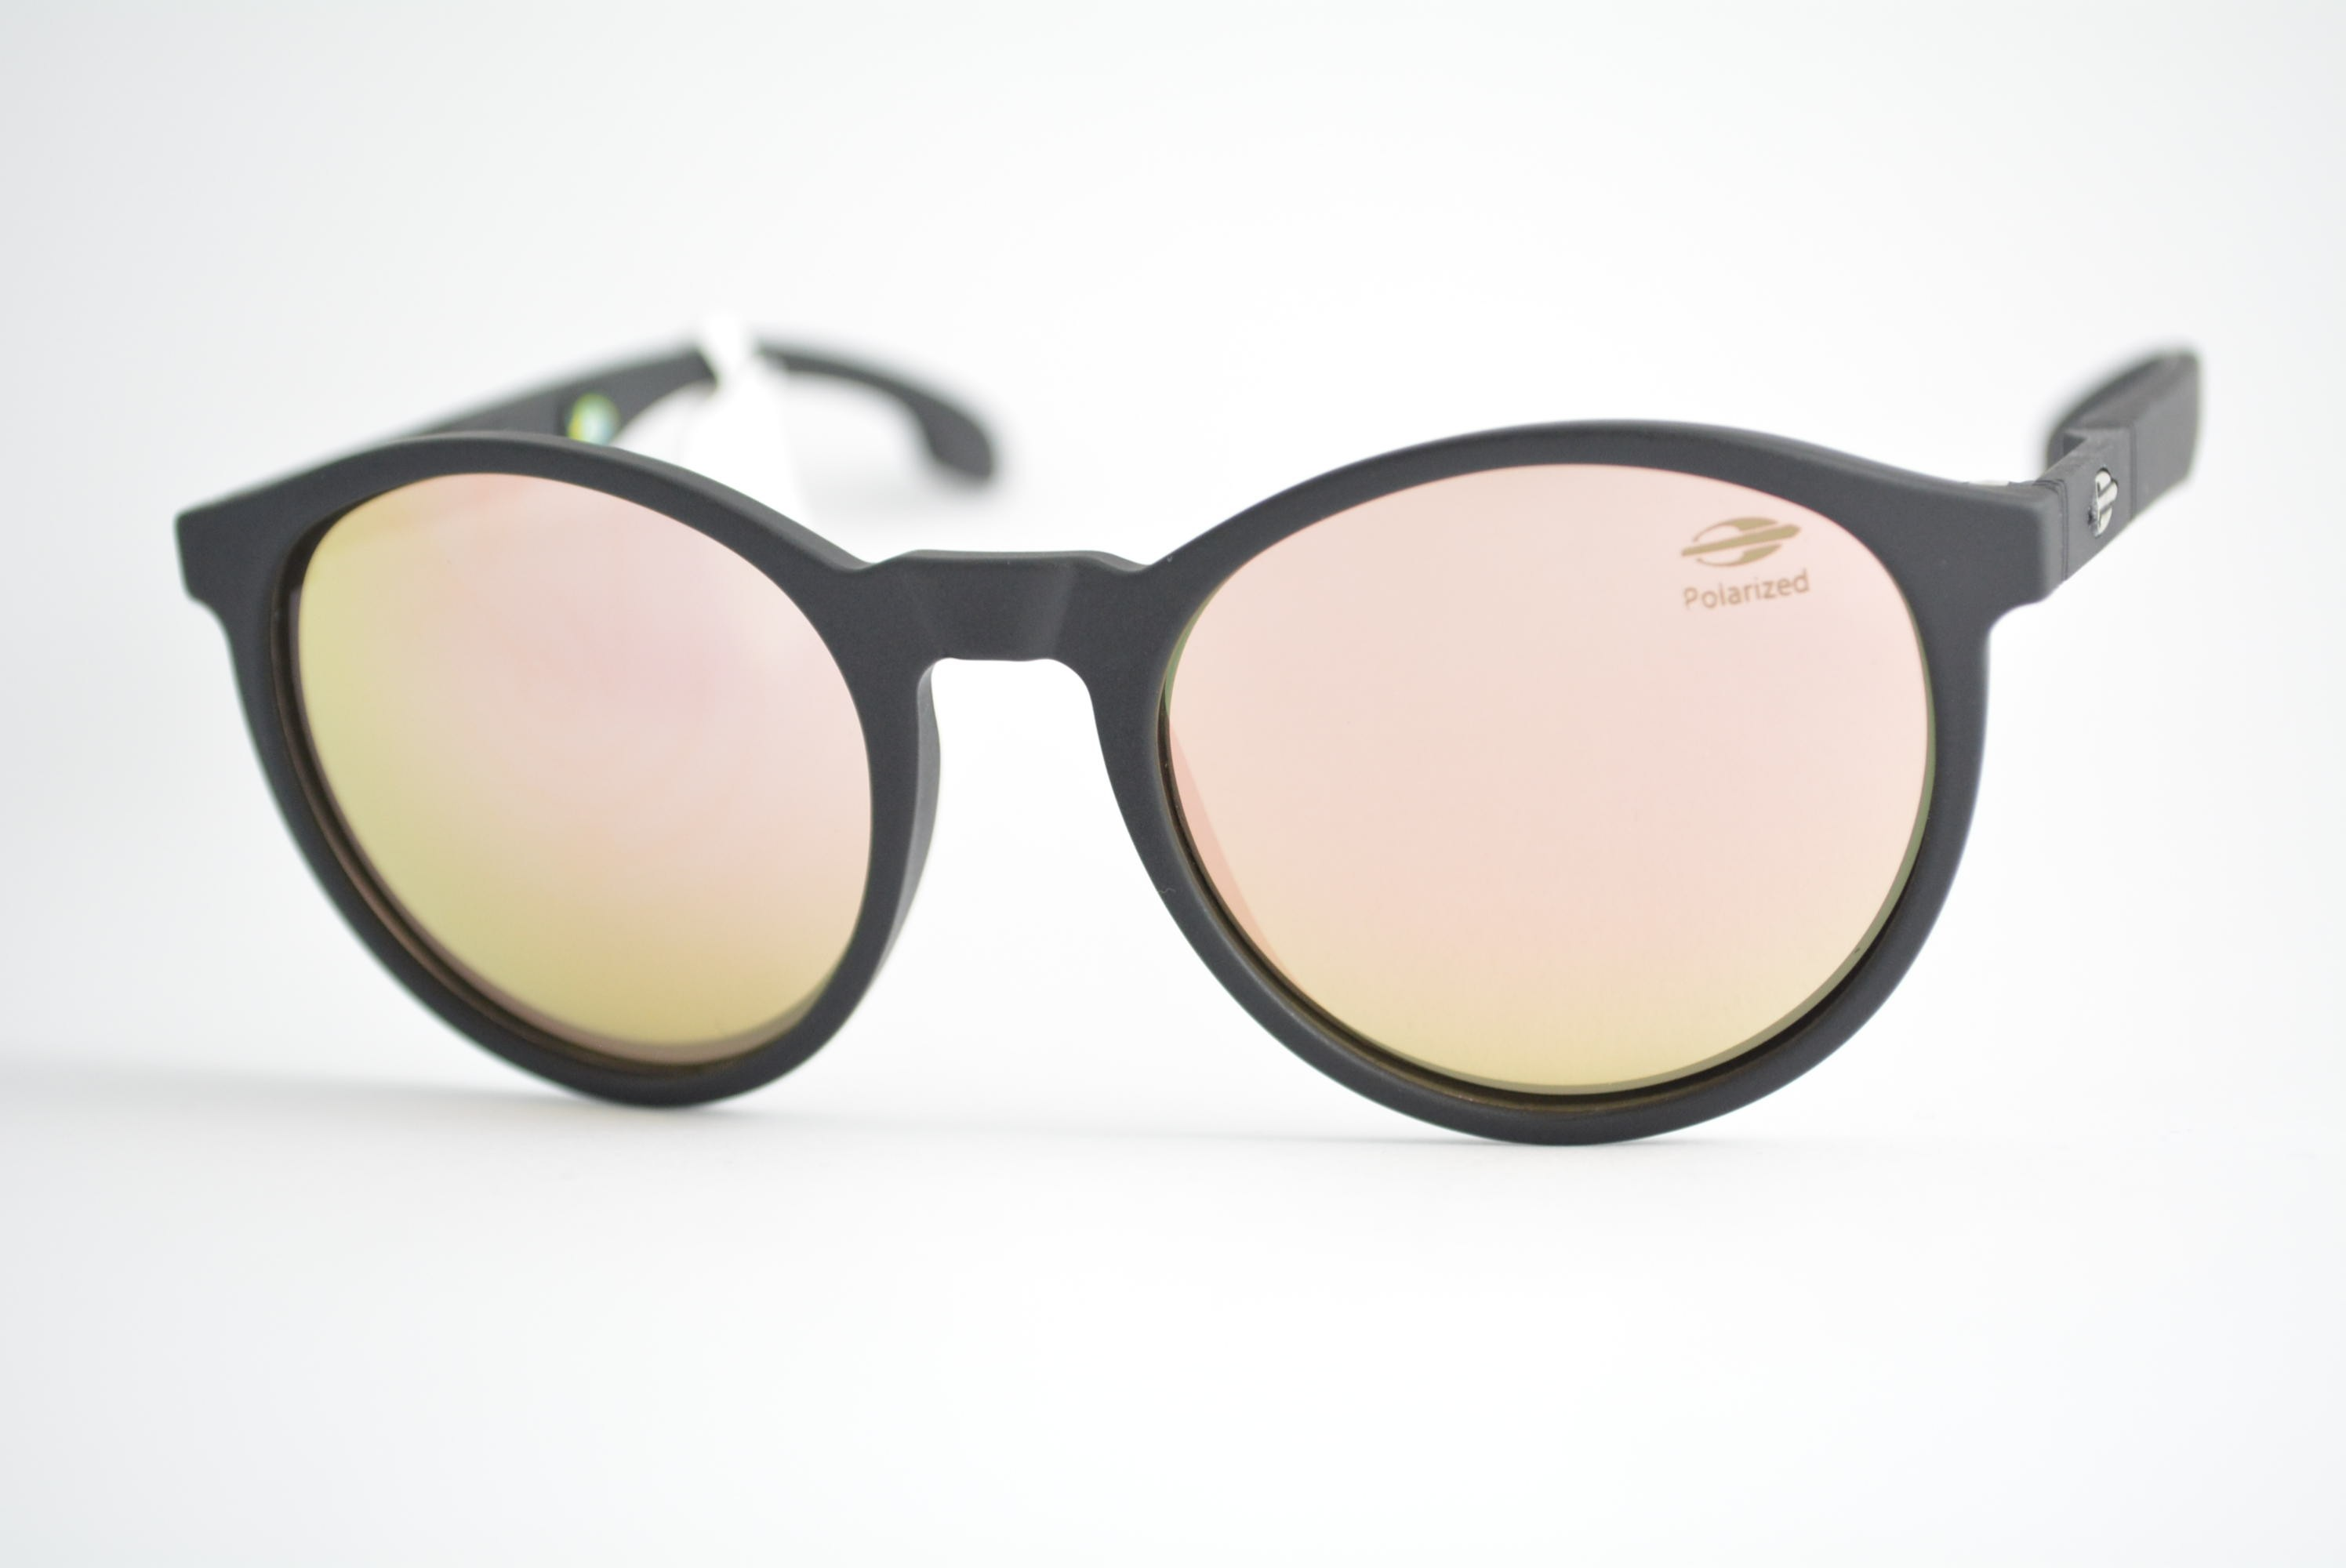 óculos de sol Mormaii mod Maui NXT m0072 a14 Infantil Ótica Cardoso dd58918ce3